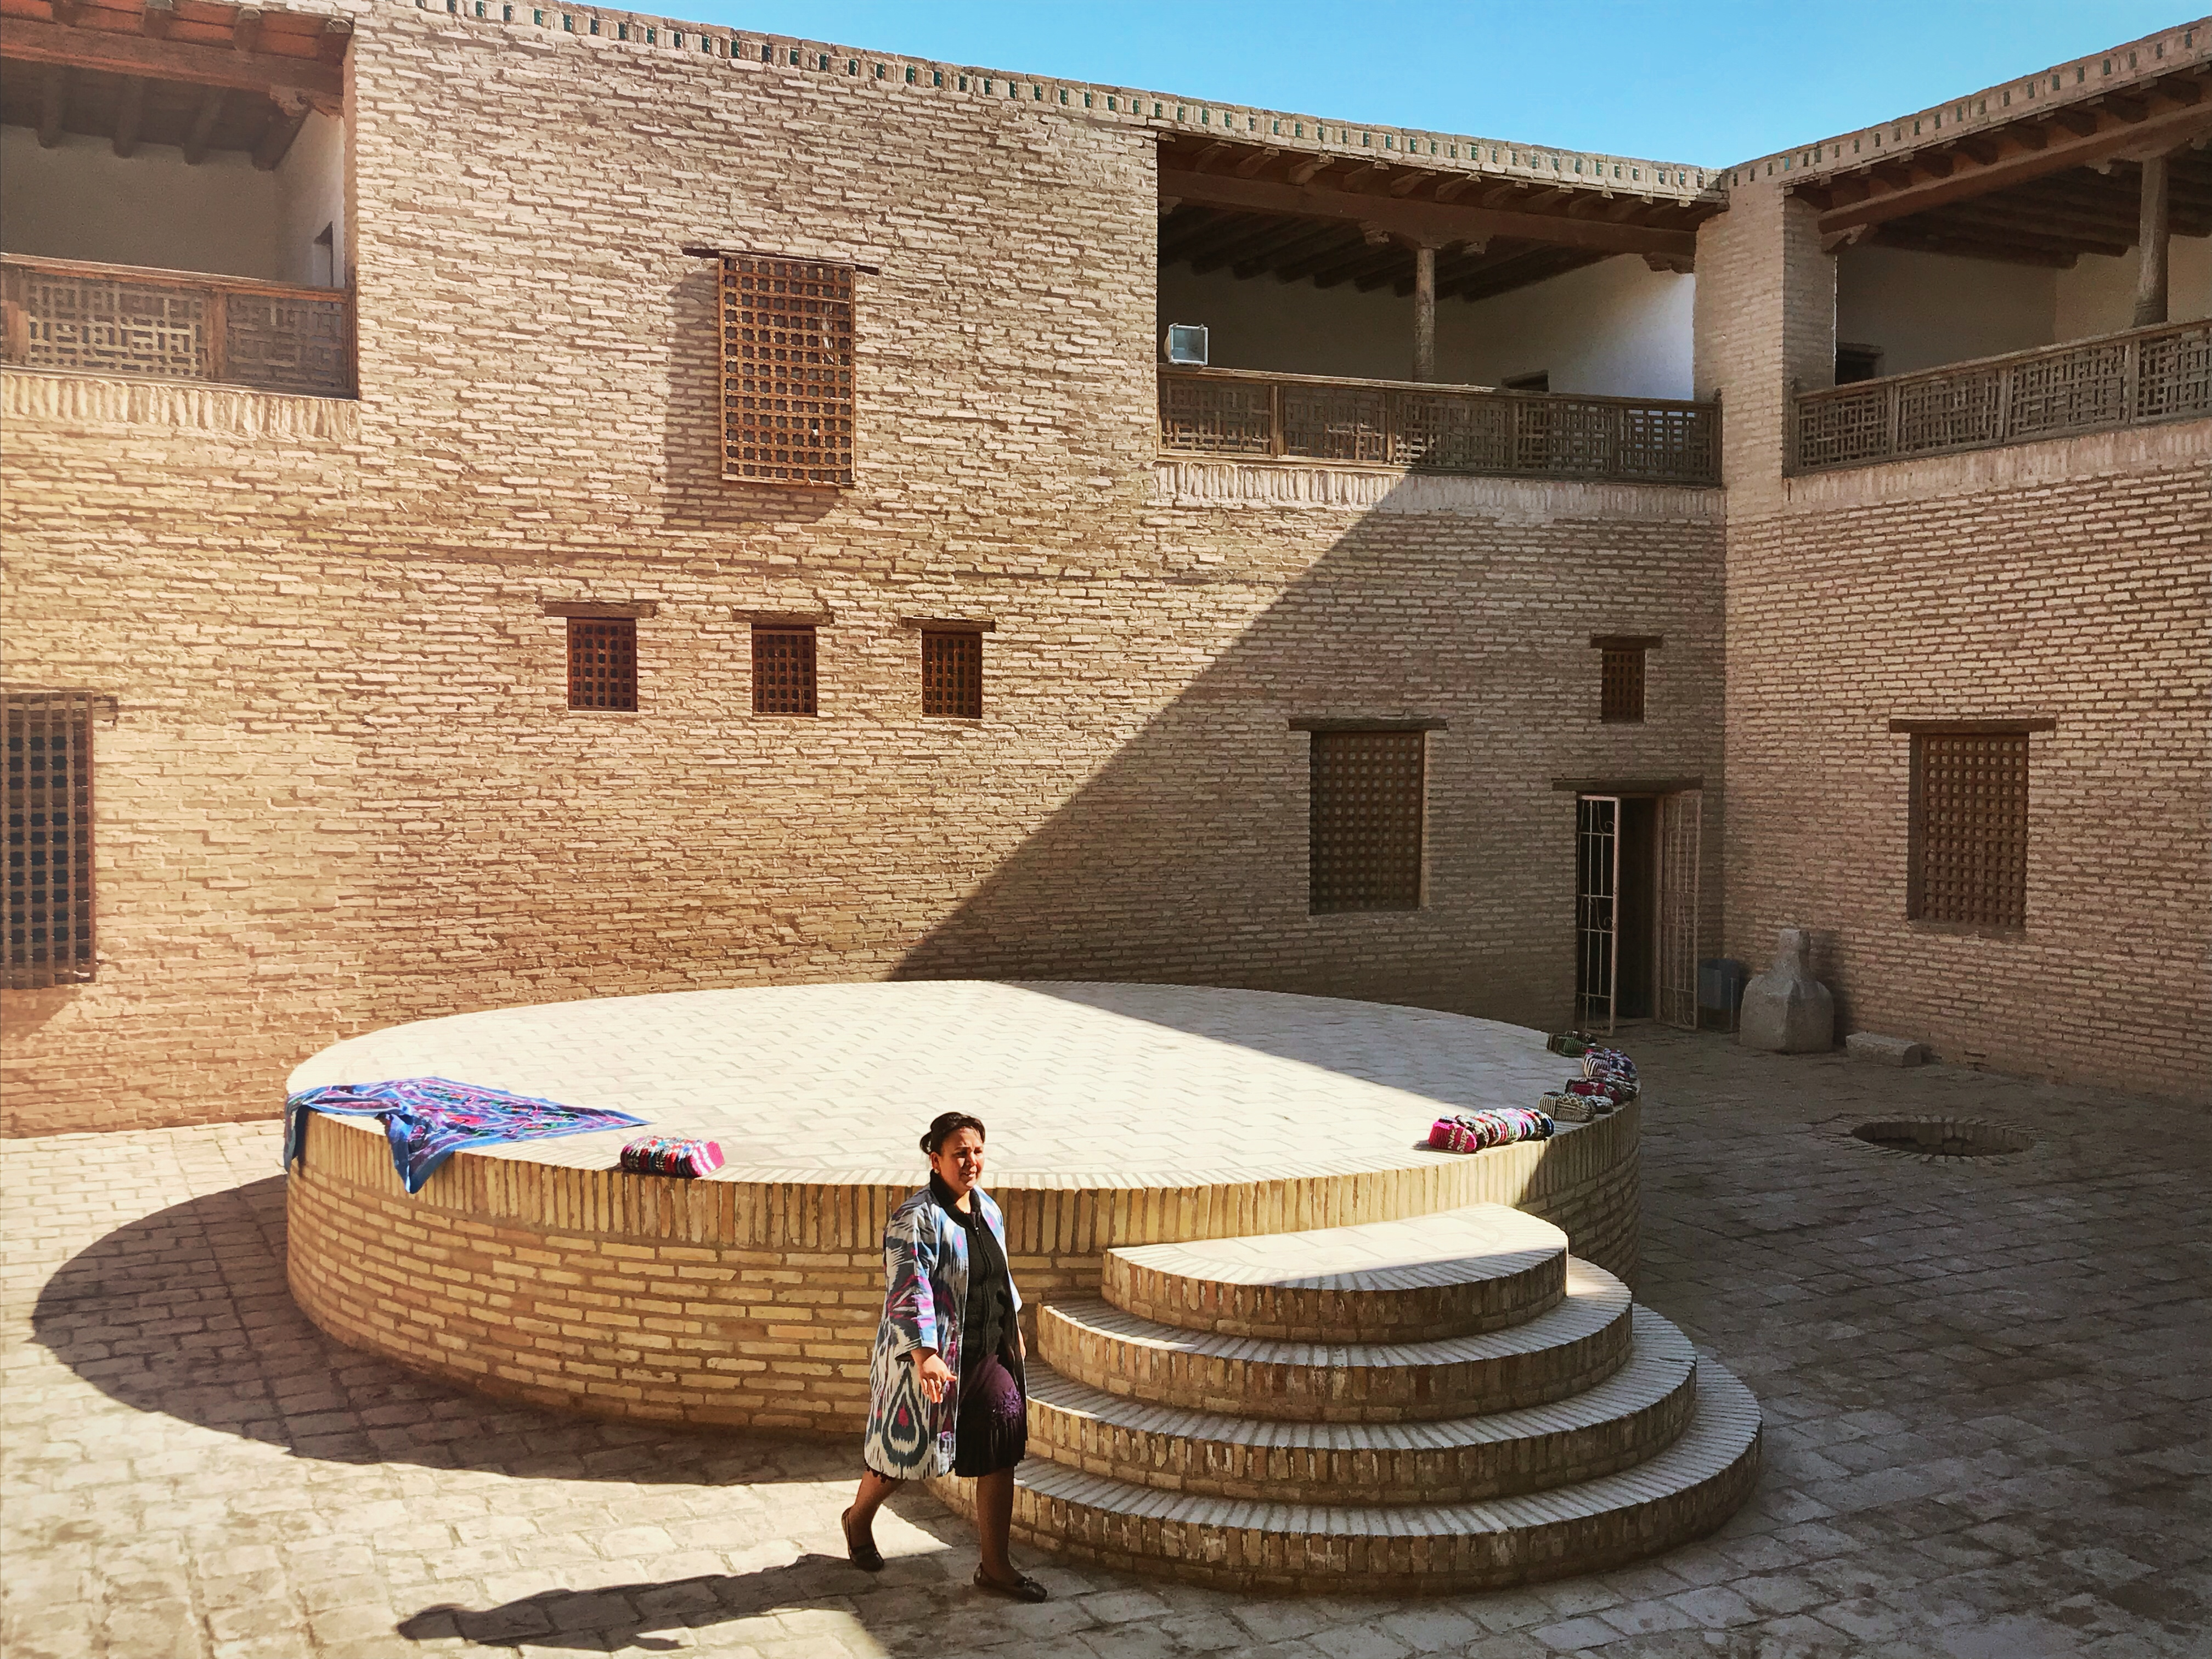 Usbekistand kscheib Palast Innenhof Zeltplatz